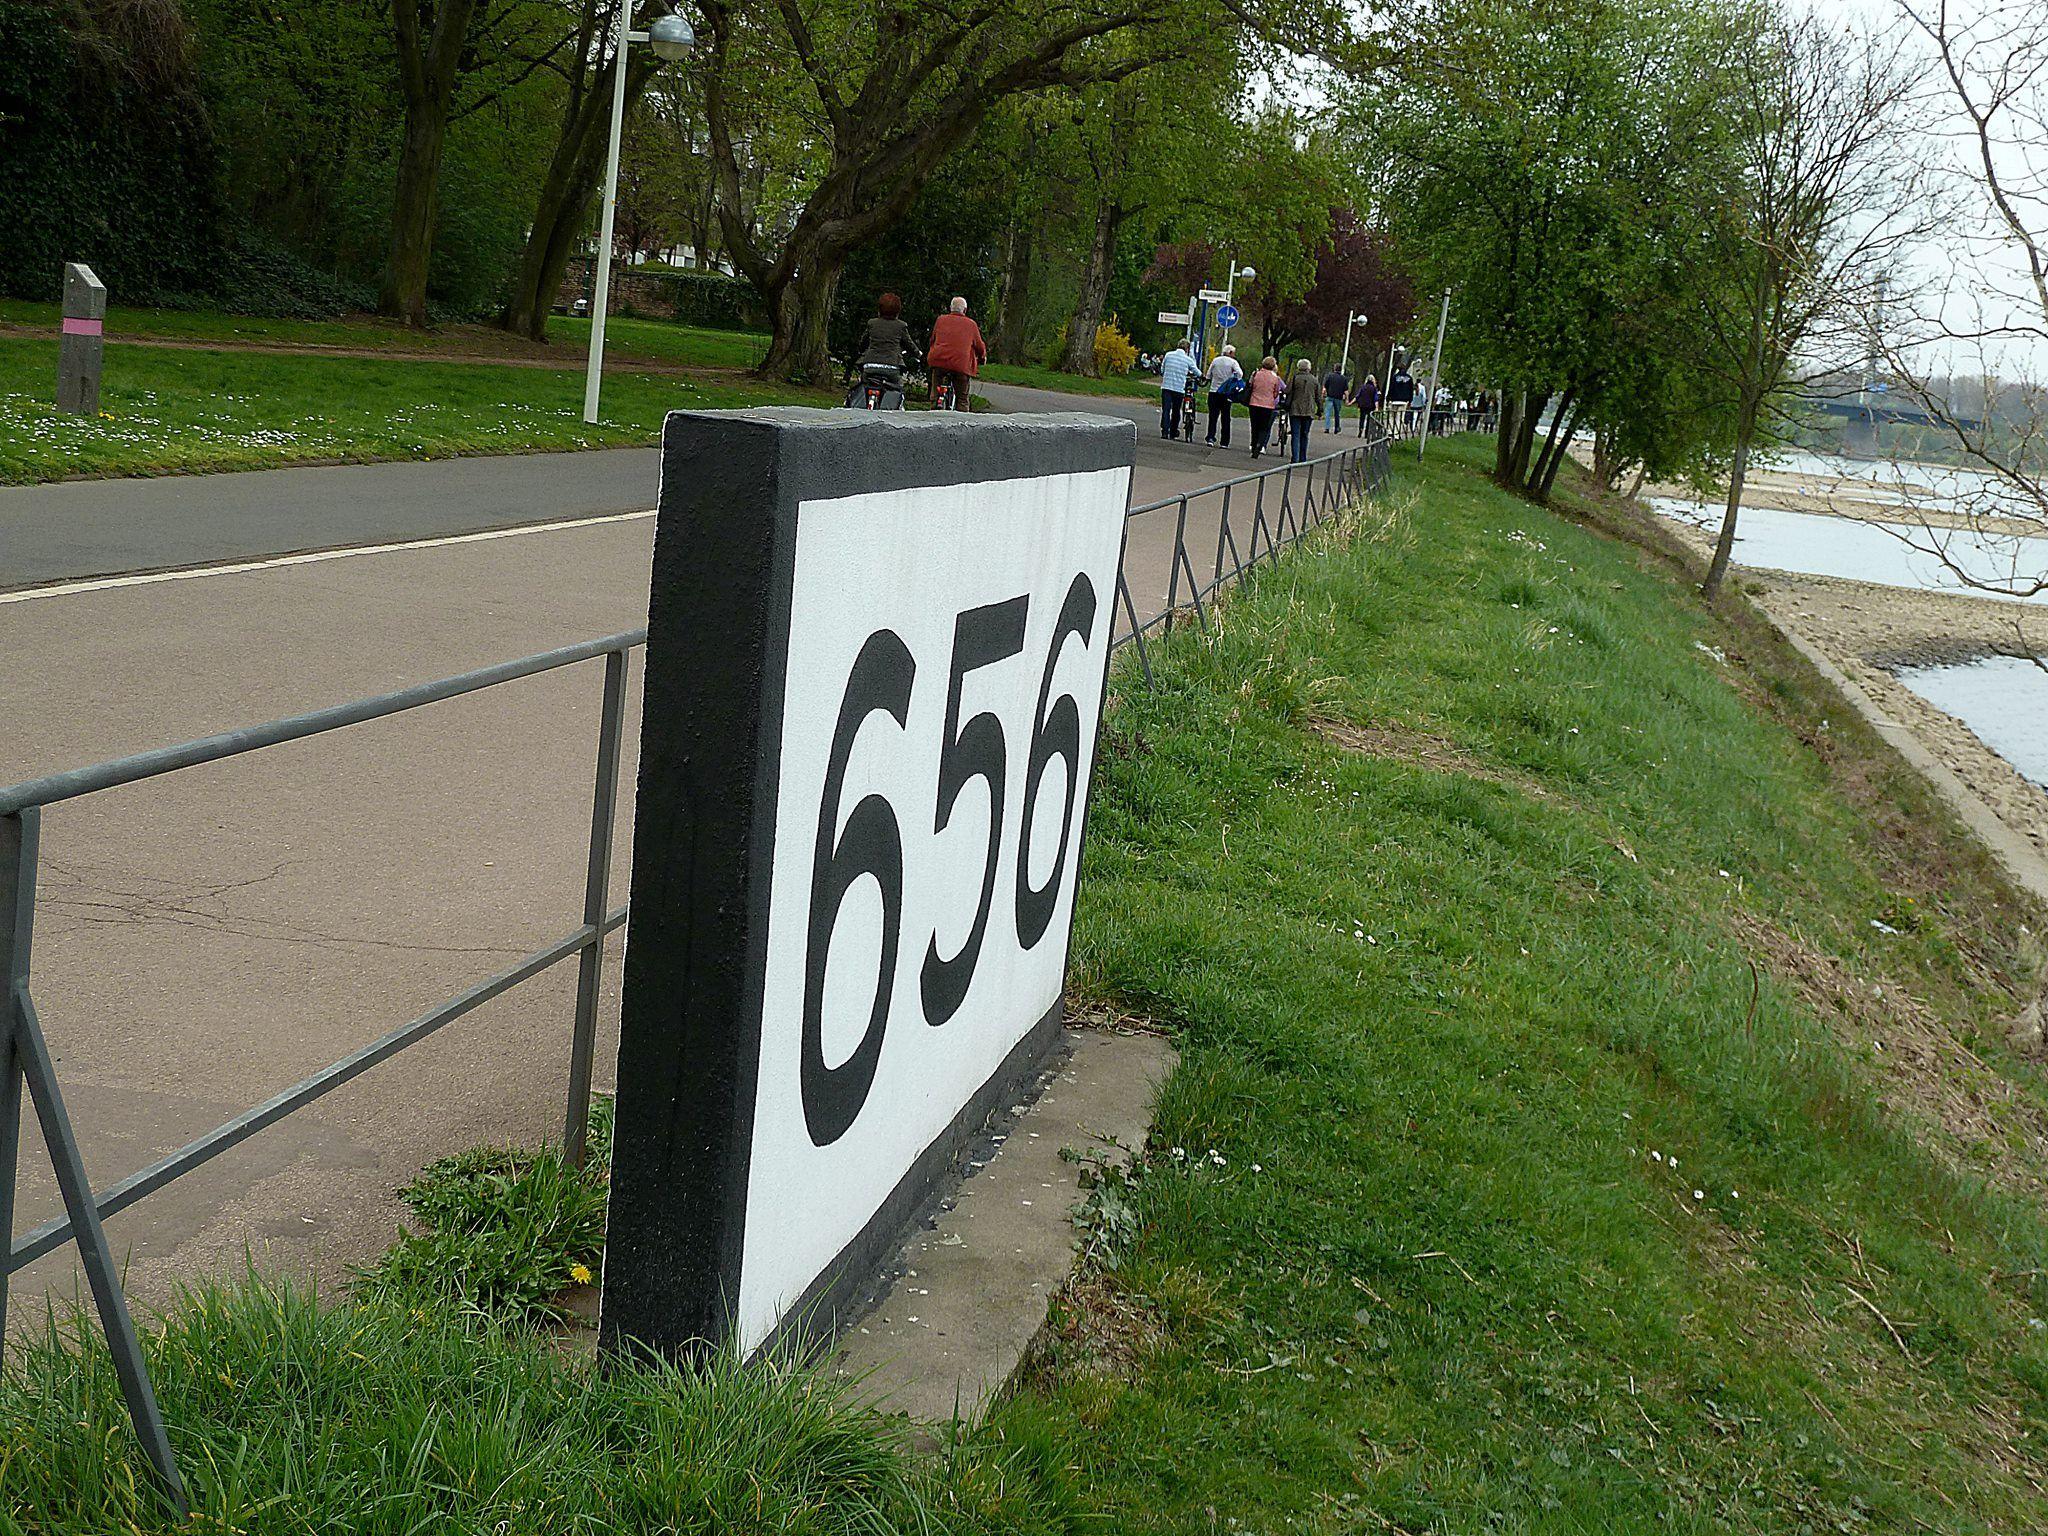 rheinkilometer-656-bonn-2